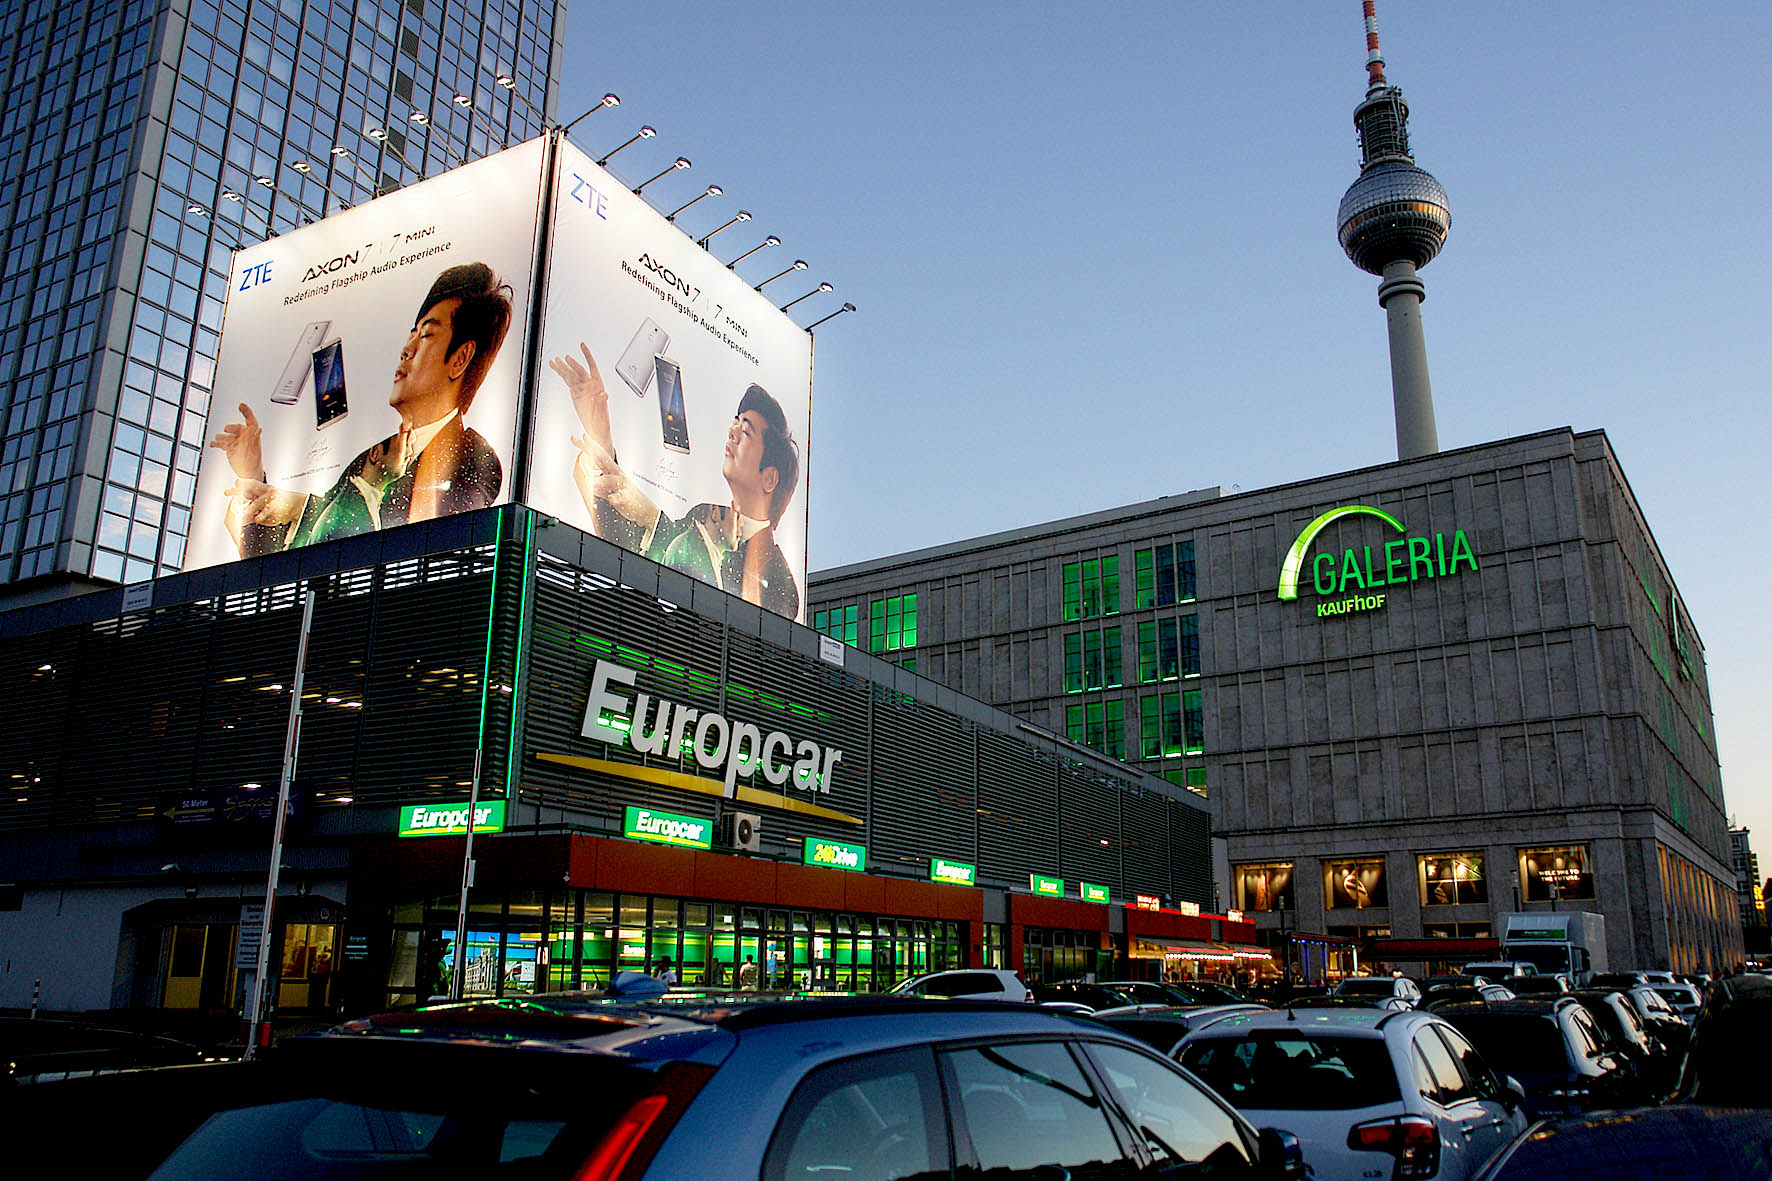 ZTE_Berlin_Park-Inn-Alexanderplatz_05